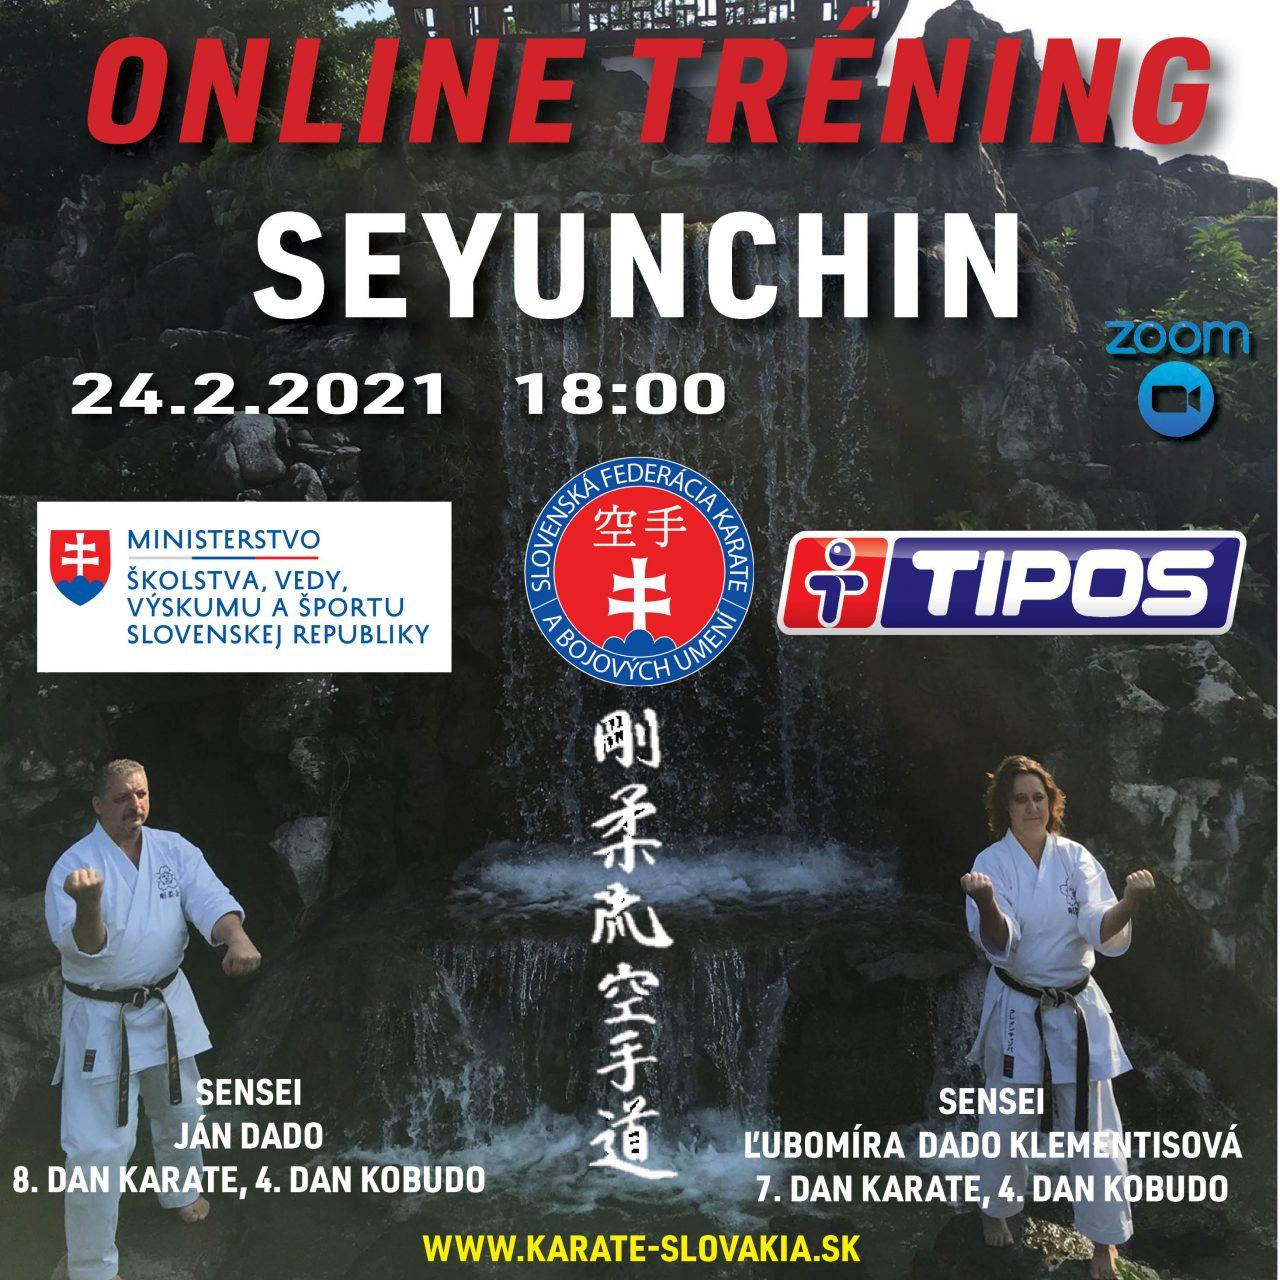 https://karate-slovakia.sk/wp-content/uploads/Lubka_Janko-1280x1280.jpg